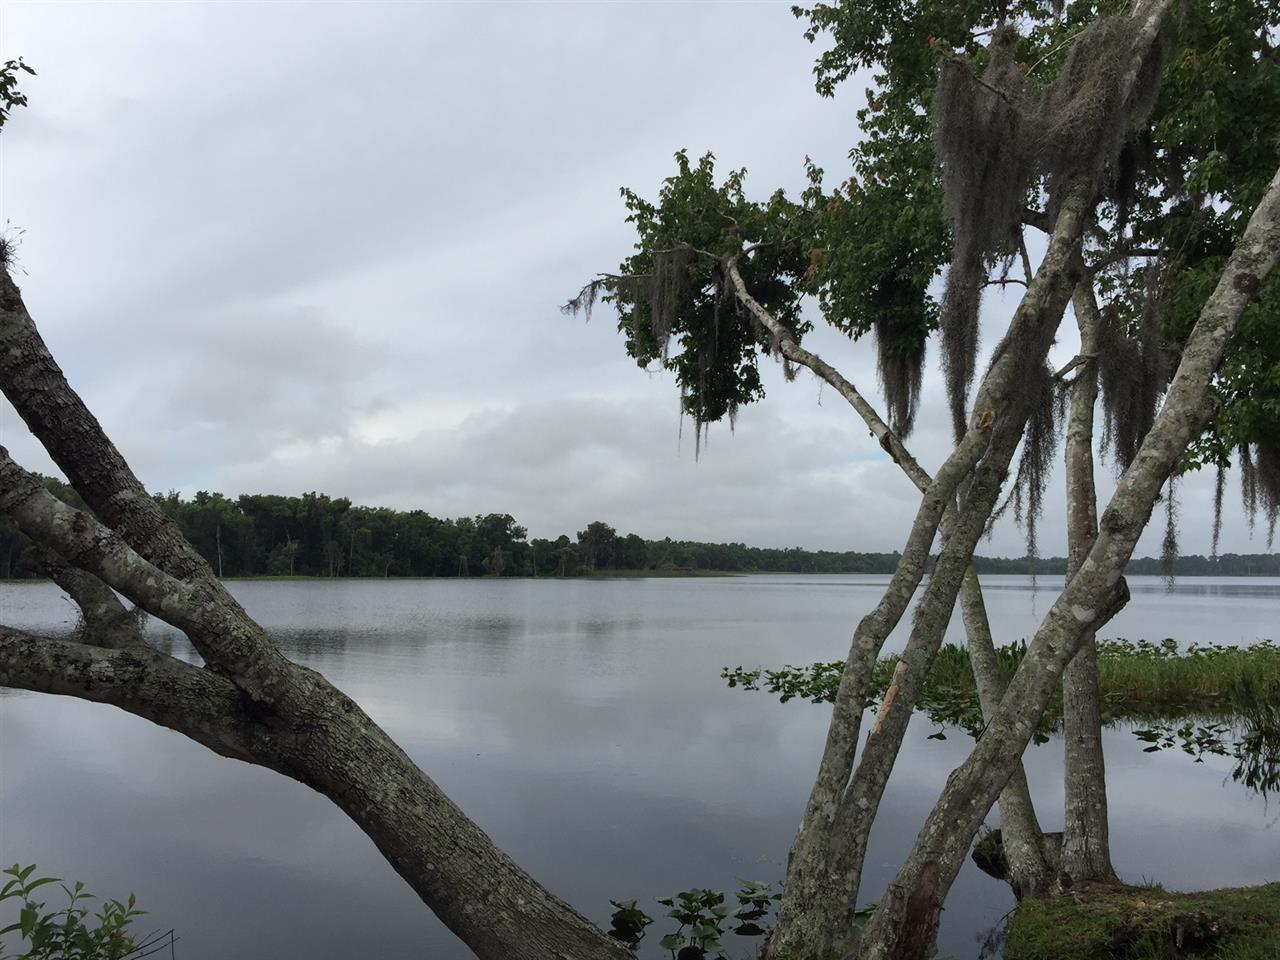 #Deland, FL #Lake Dias